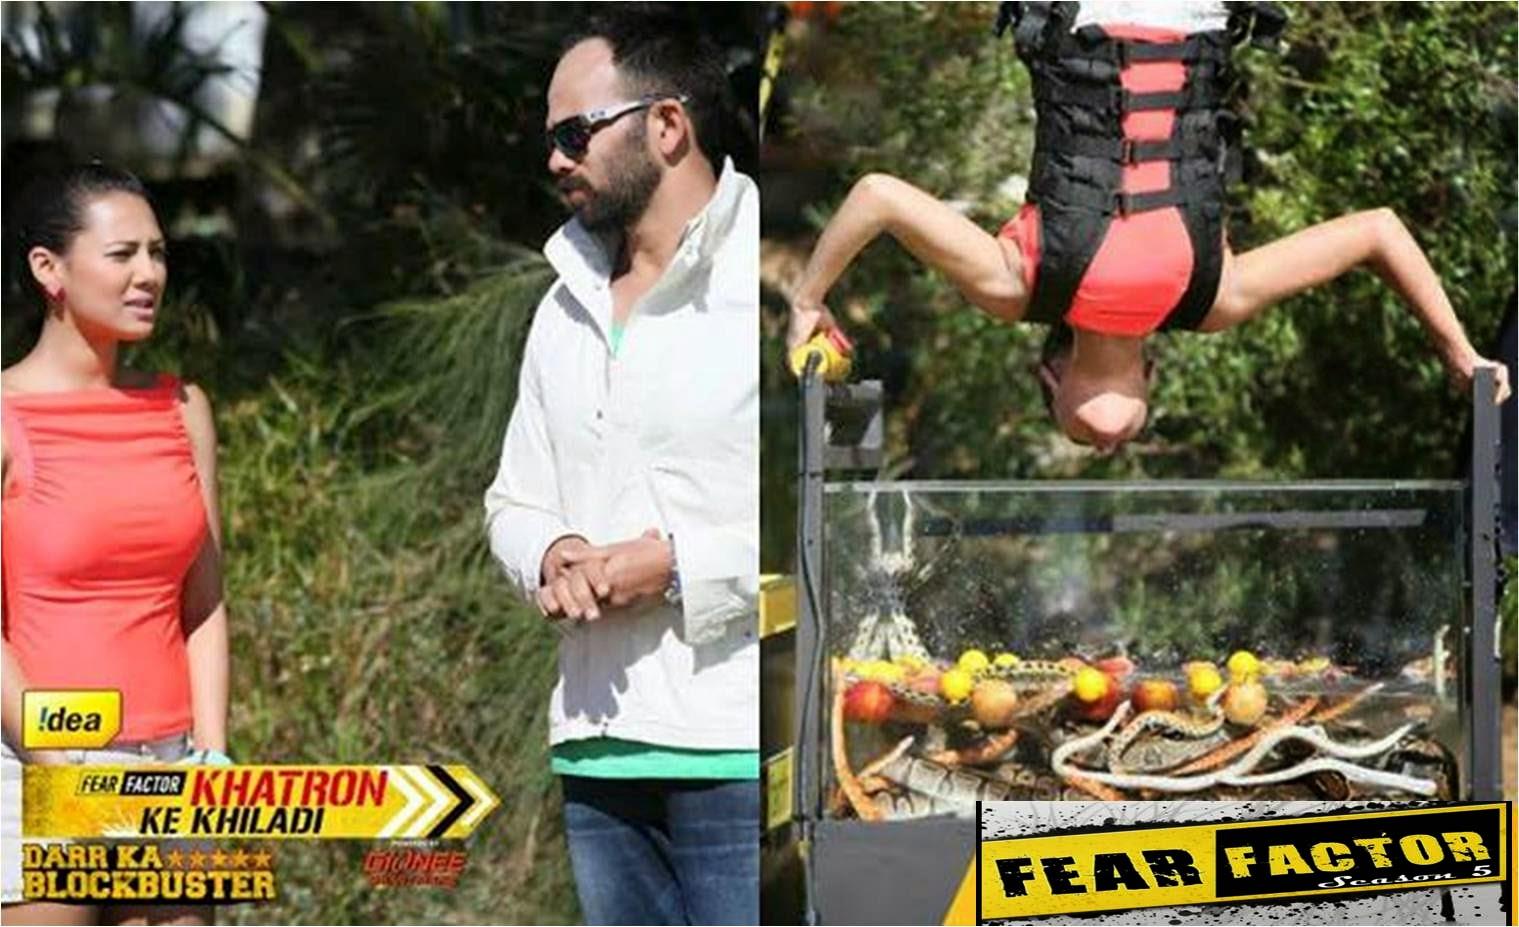 Khatron Ke Khiladi Rochelle finding objects from a glass tub of 80 snakes in a Darr Ka Blockbuster stunt